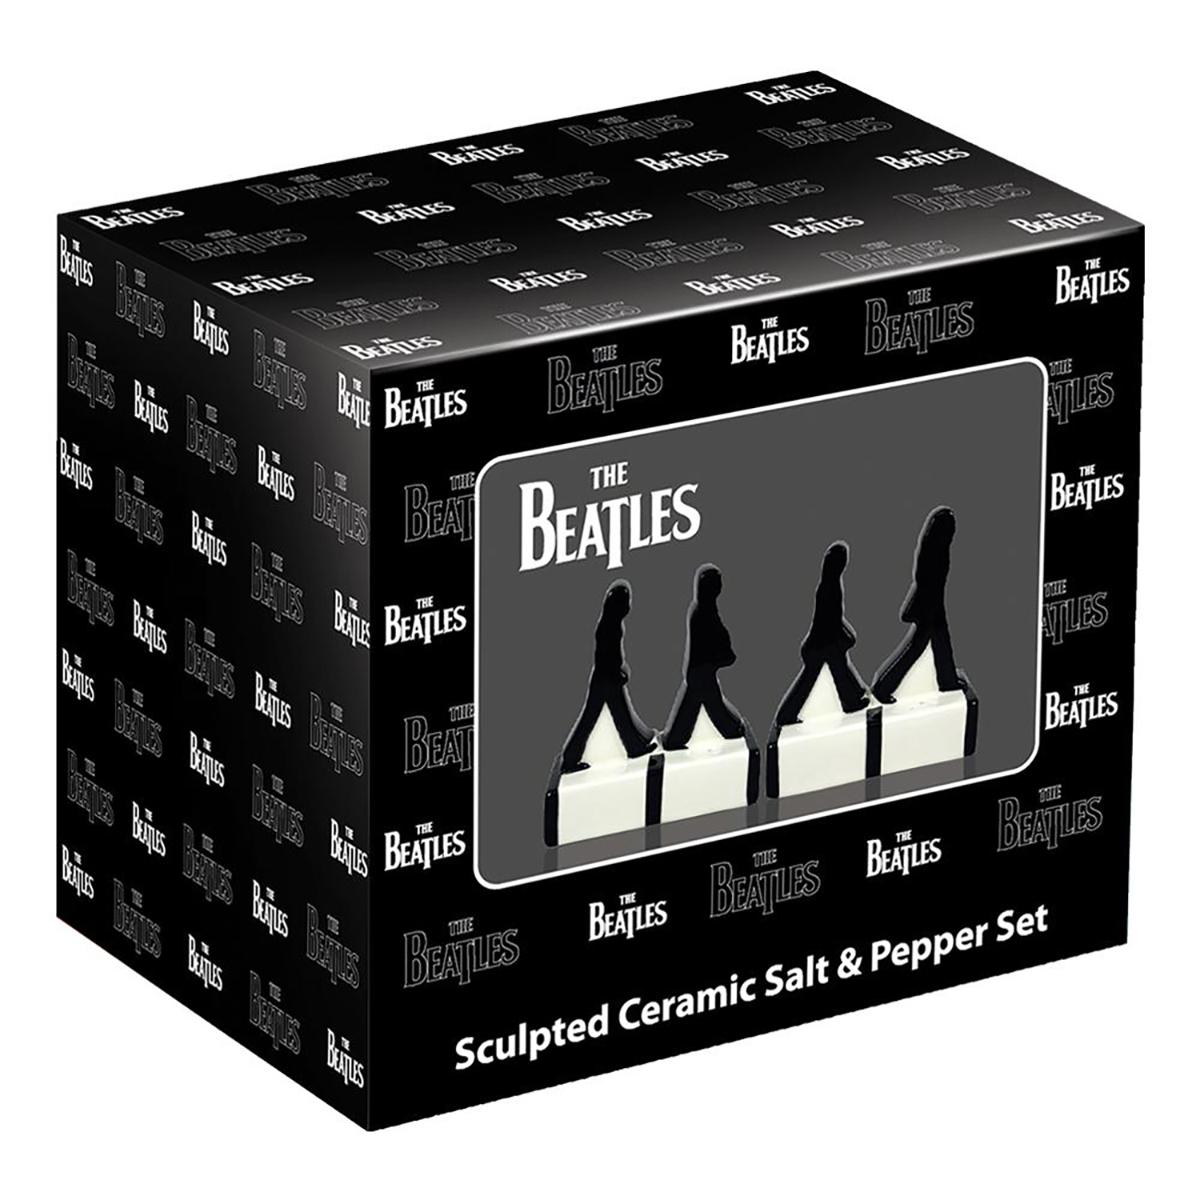 The Beatles Abbey Road Silhouettes Salt & Pepper Set